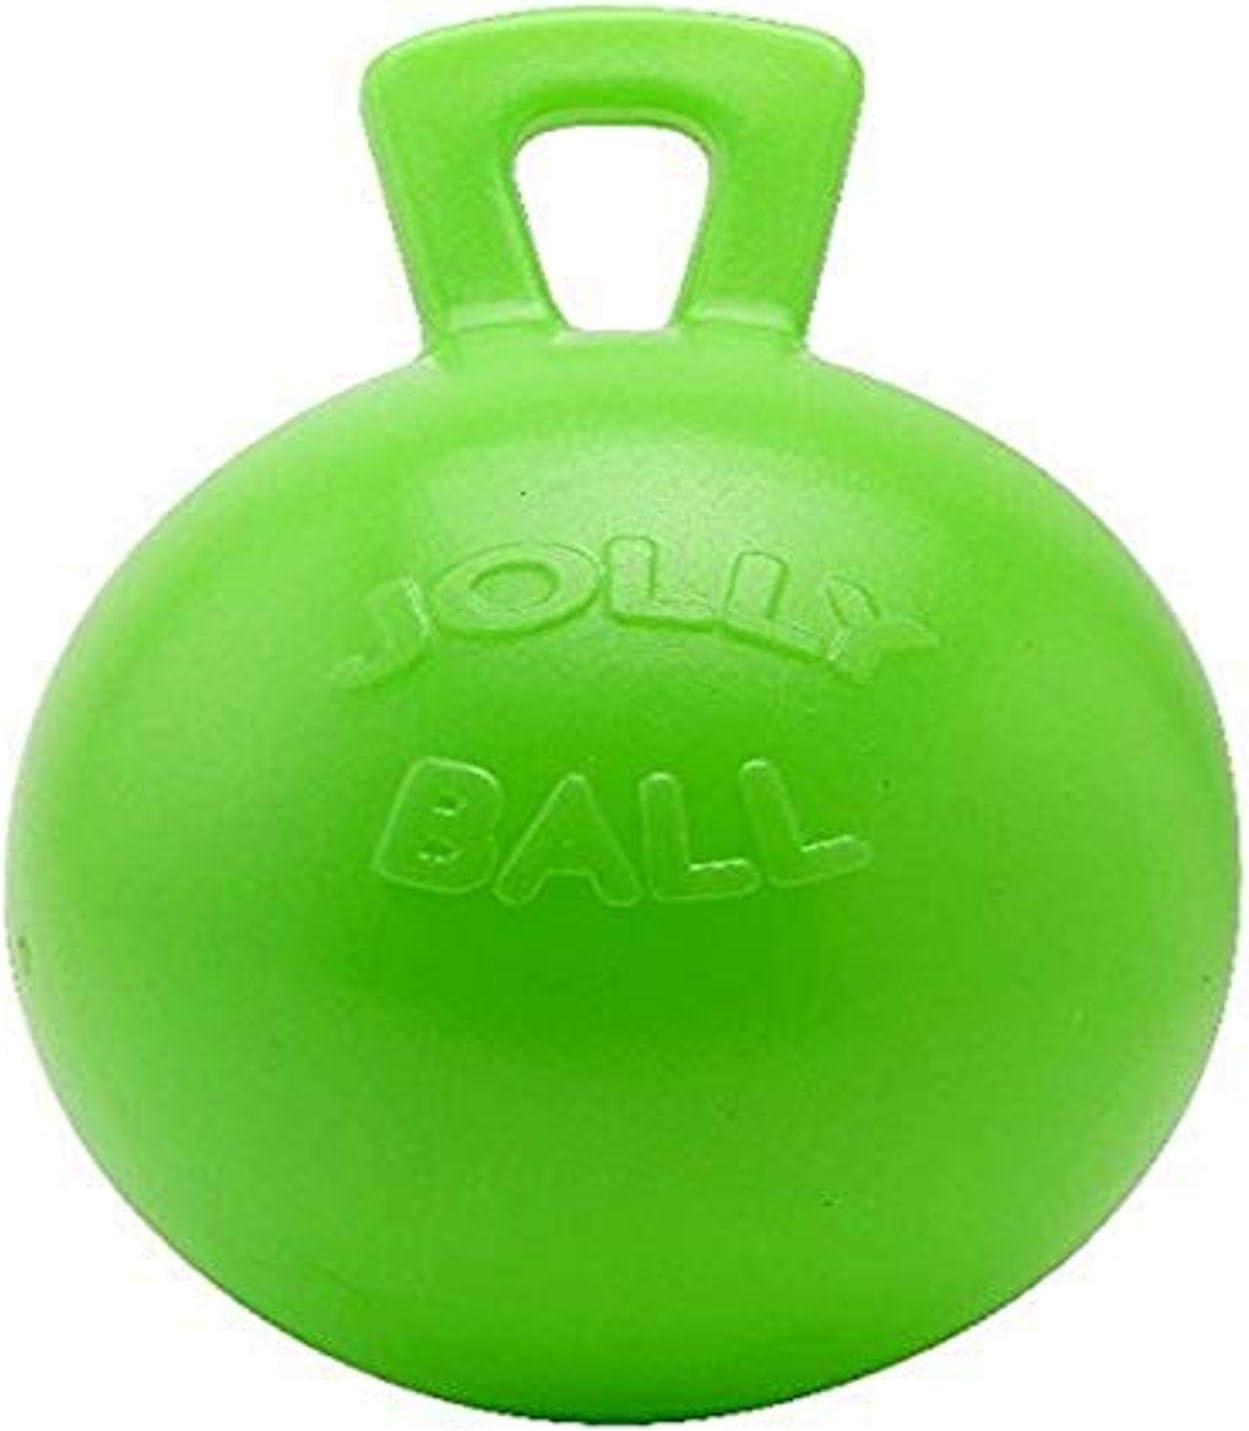 Horsemen/'s Pride Jolly Mega BallPuncture ResistantHorse Field Boredom Toy